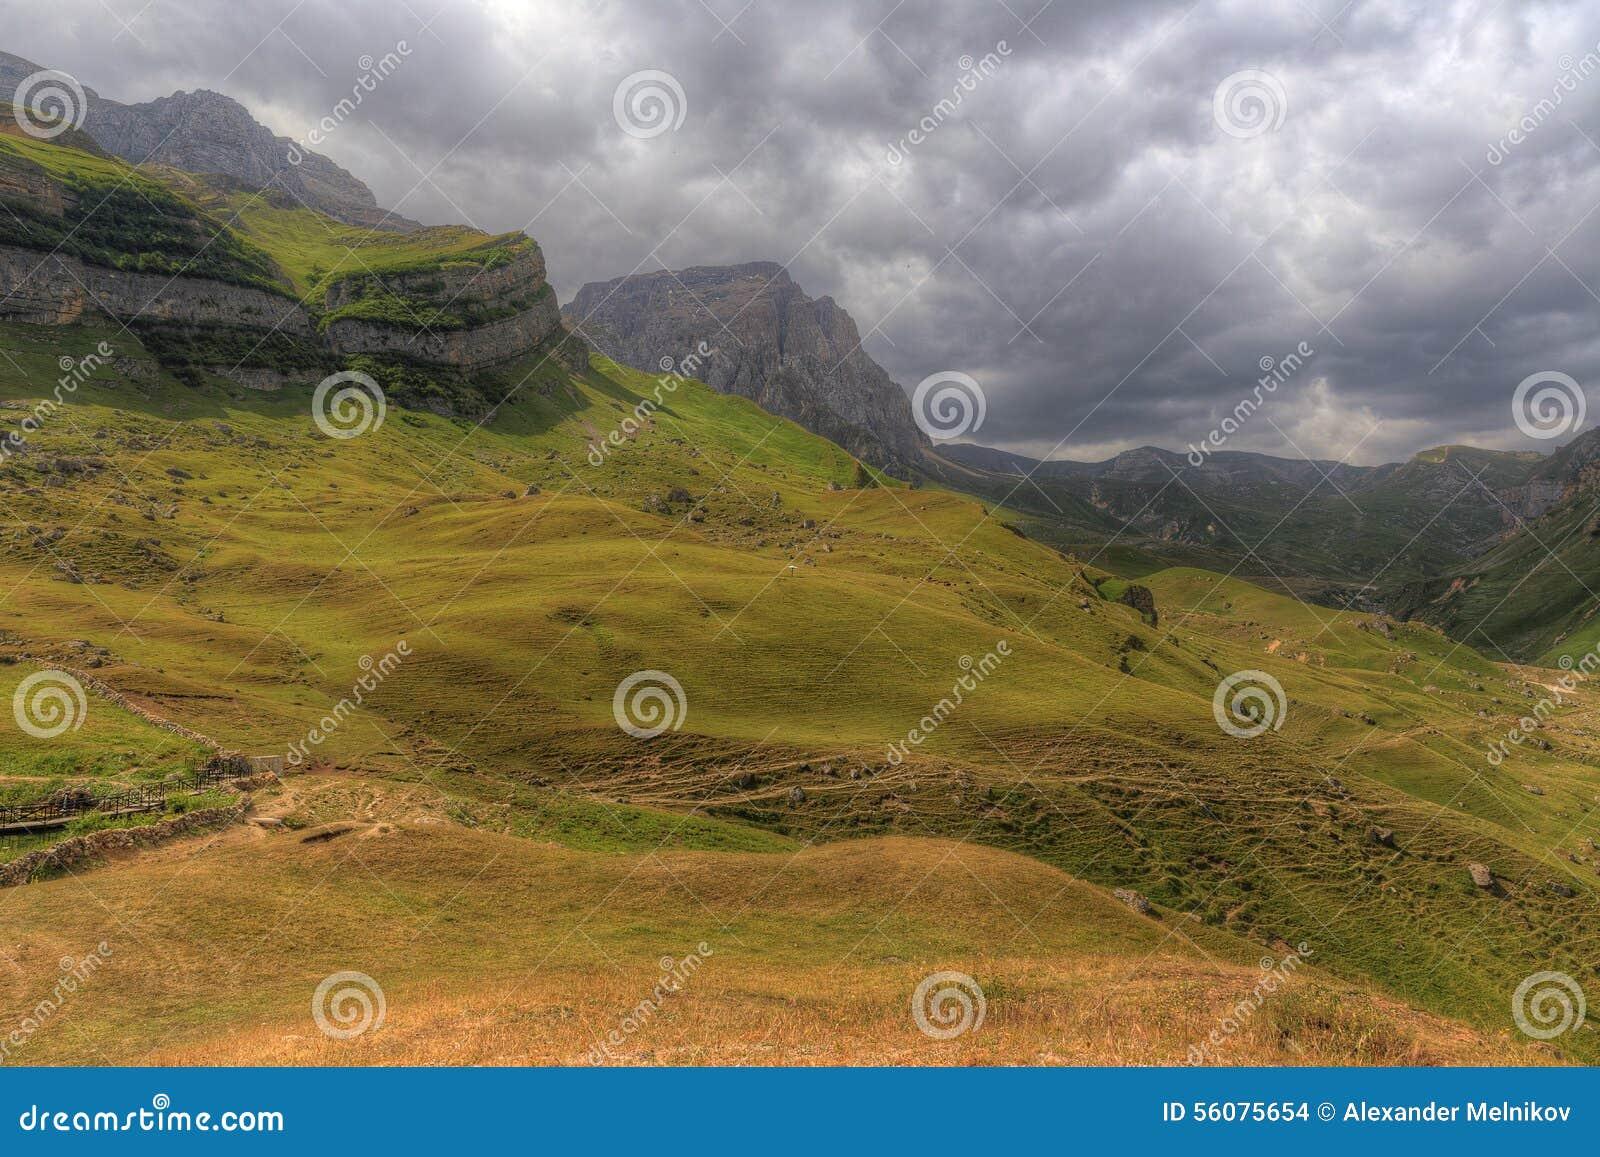 Shahdag Azerbaijan  City pictures : Mountains National Park Shahdag Azerbaijan Stock Photo Image ...